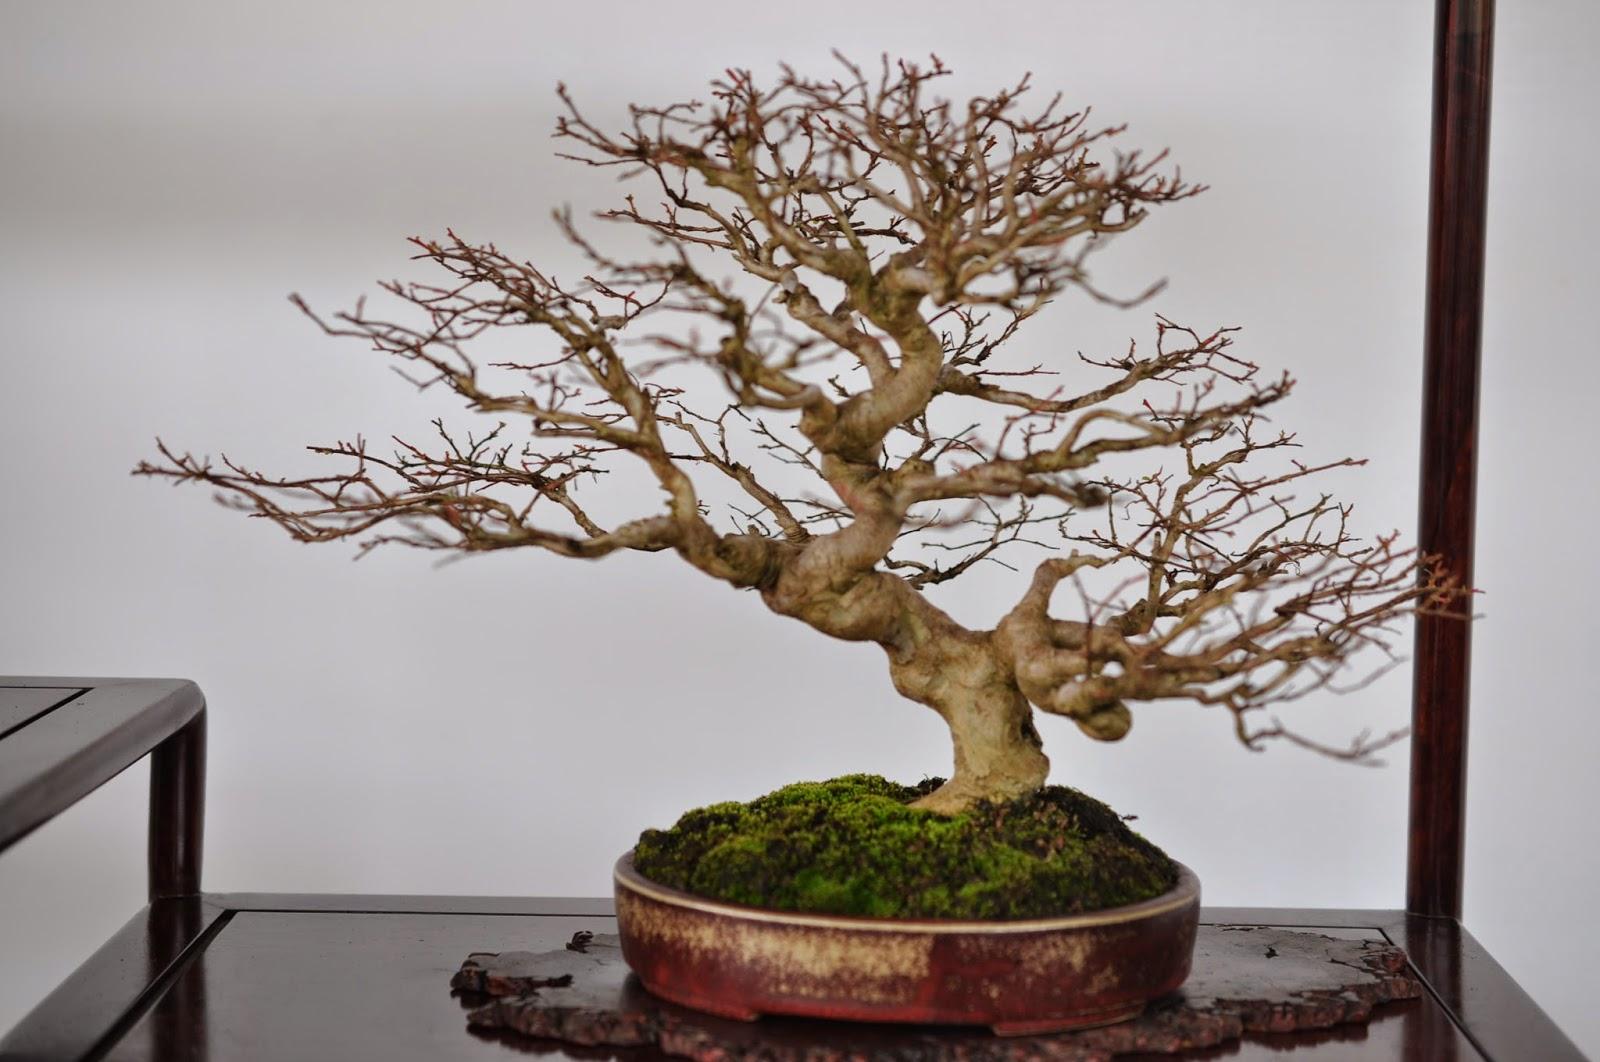 All In One Bonsai And Ceramics Taichung Bonsai Exhibition